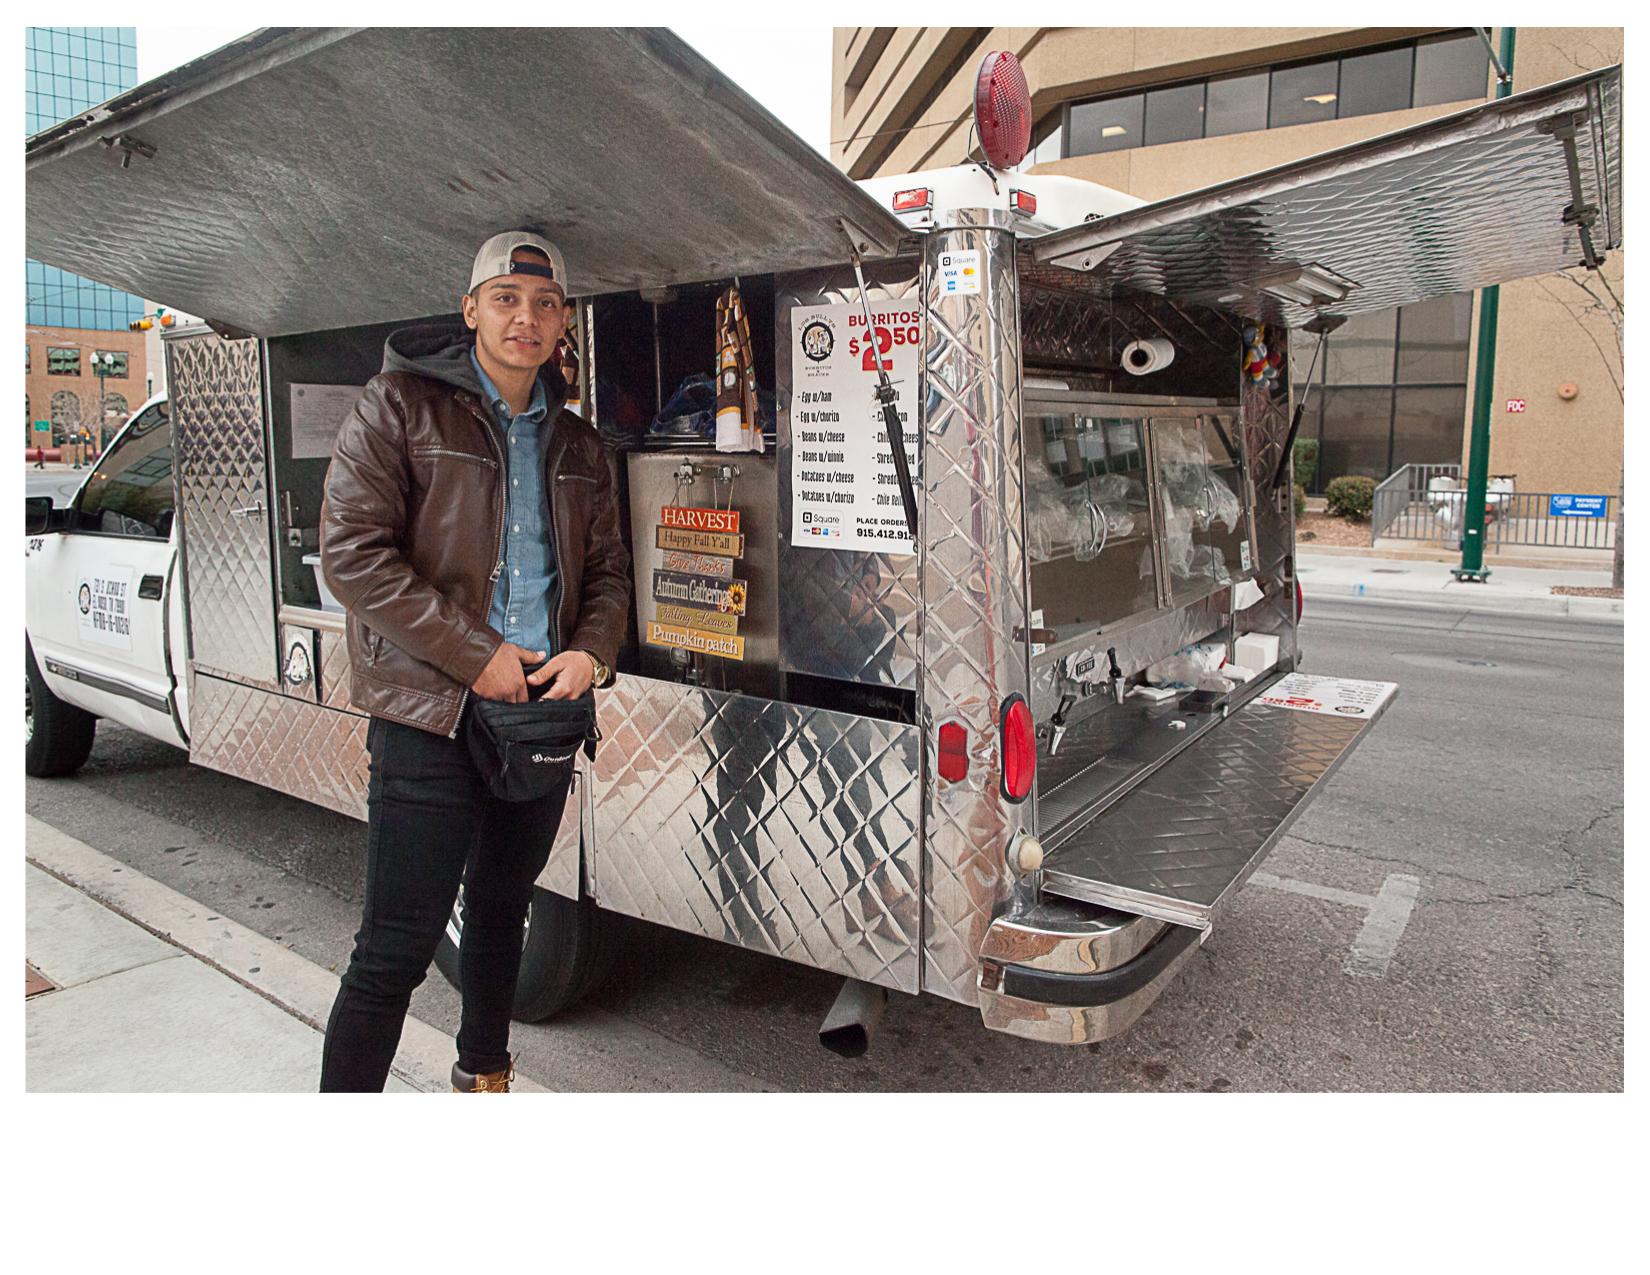 Luis and His Burrito Truck, El Paso, TX